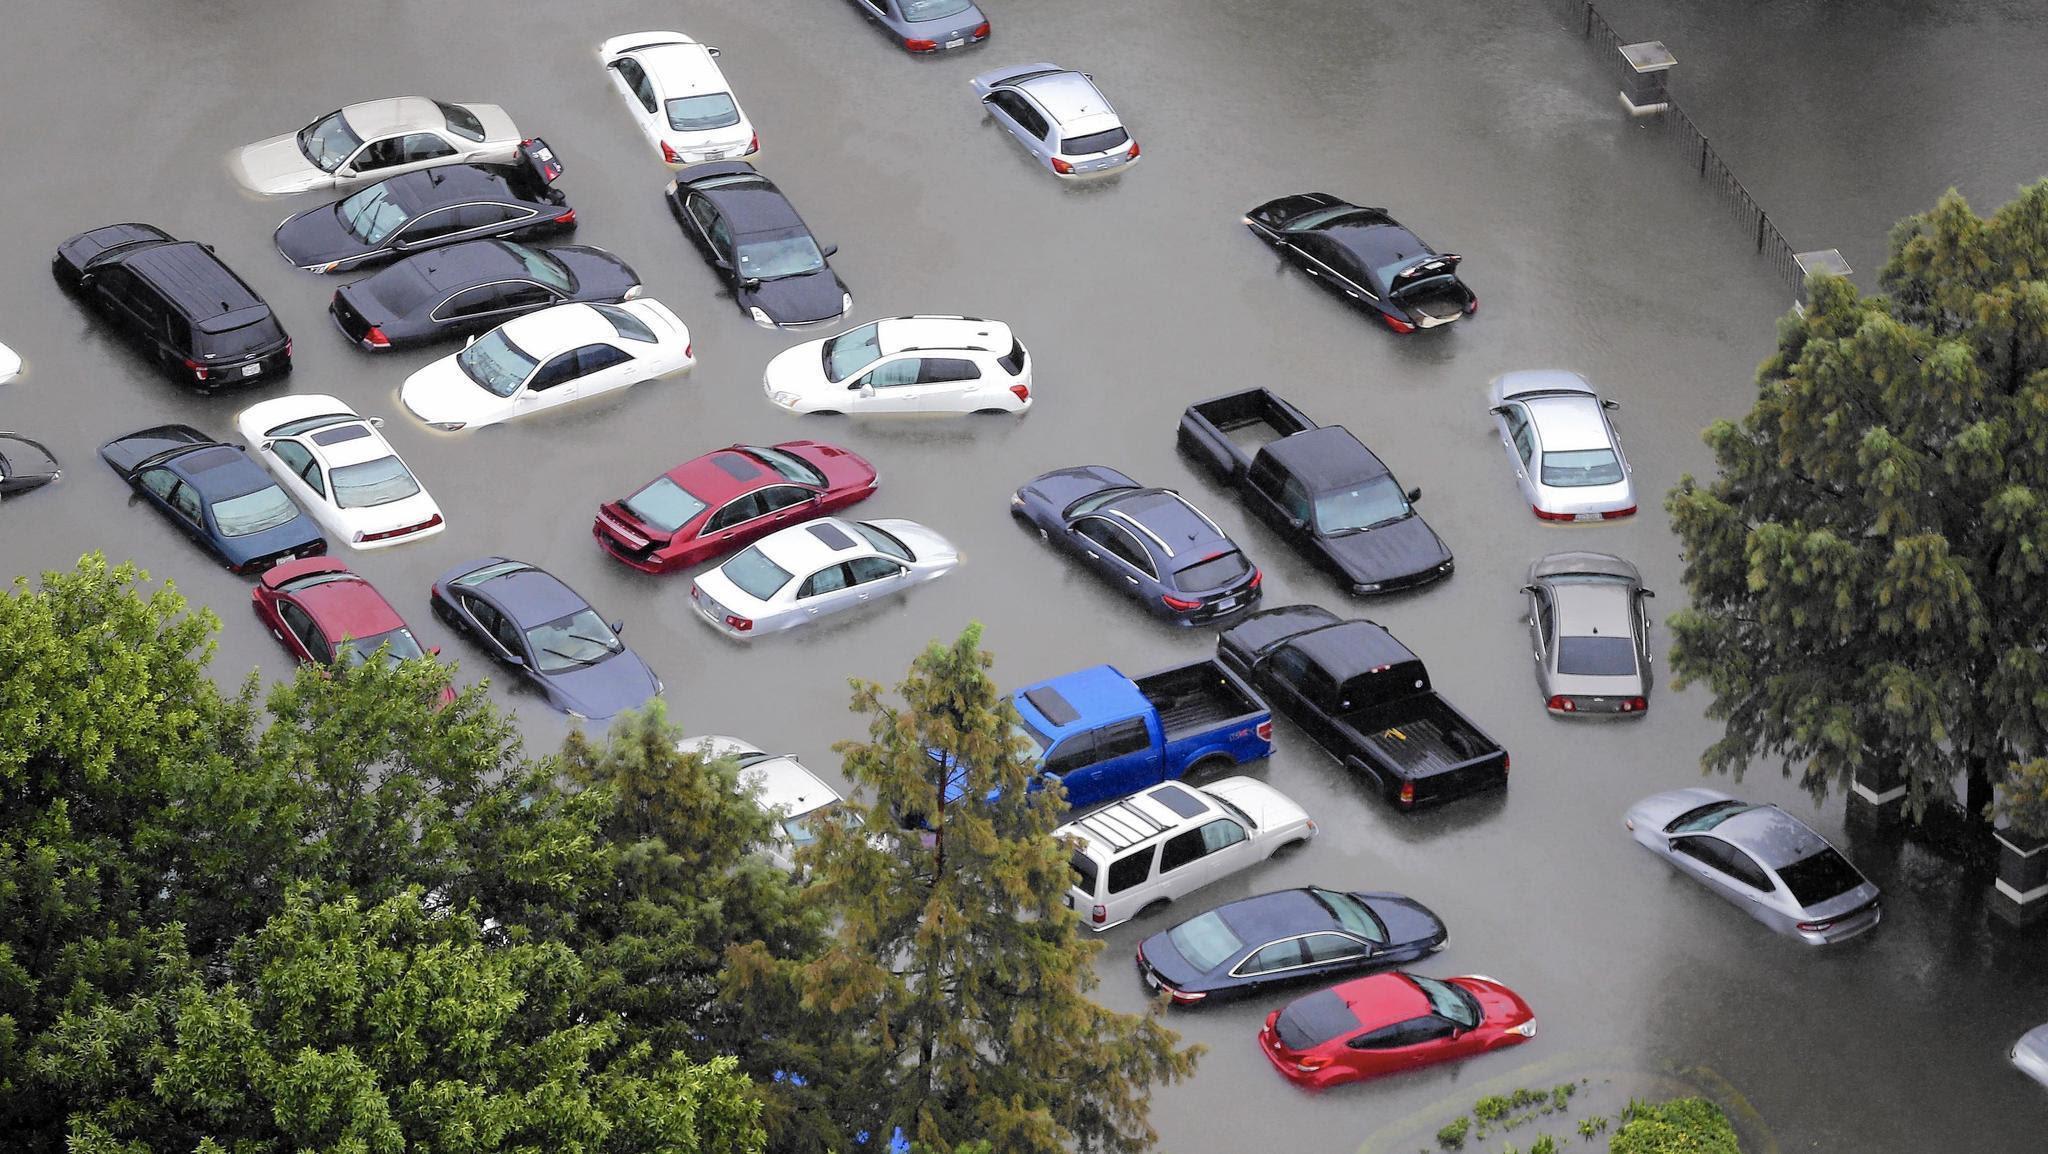 After hurricanes, flood of storm-damaged cars heading for market - Chicago Tribune